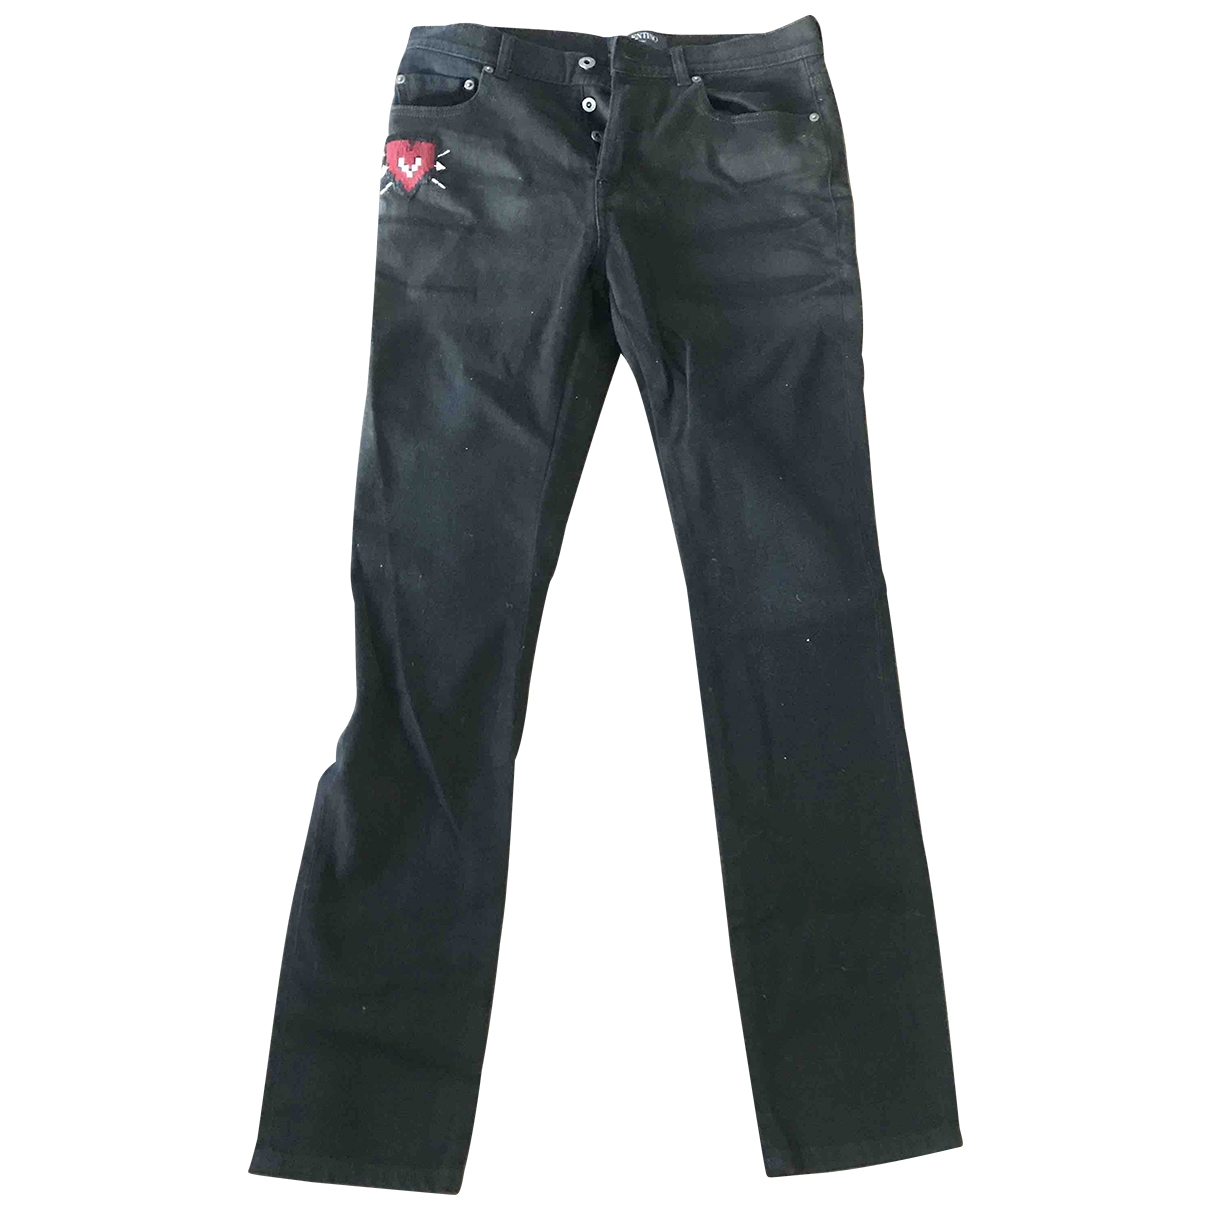 Valentino Garavani \N Black Cotton - elasthane Jeans for Men 31 US